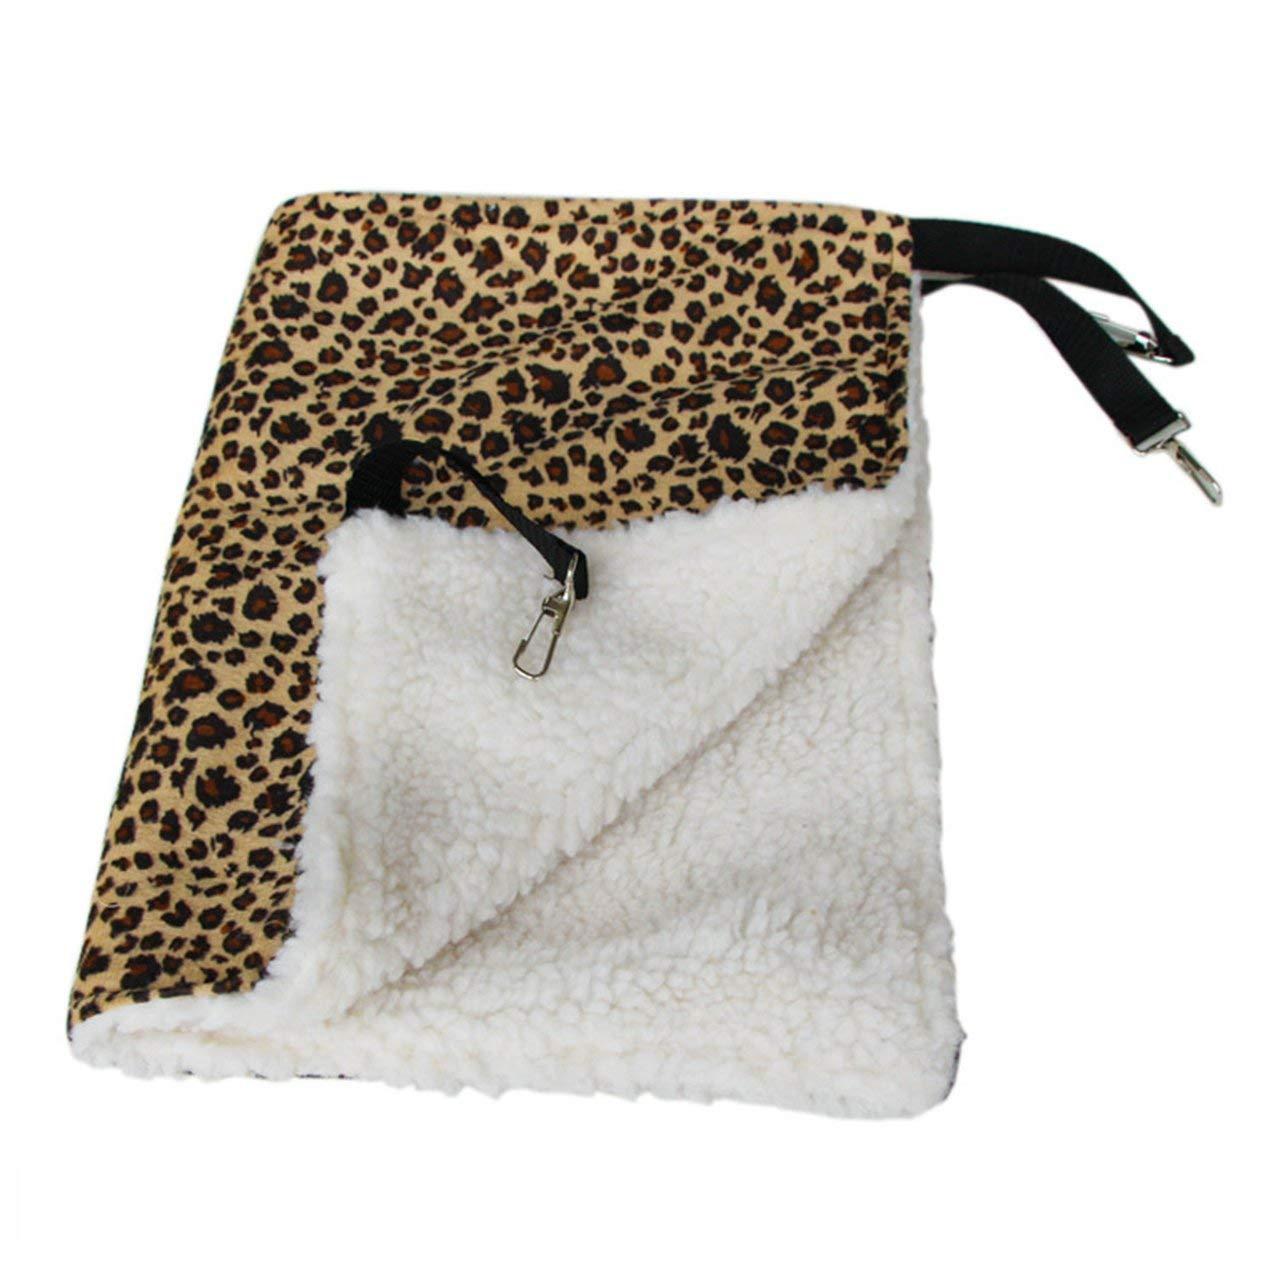 WOSOSYEYO Hot Hä ngende Katze Cat Bed Soft Cat Hä ngematte Winter Hä ngematte Tier Kä tzchen Cage Bed Cover Kissen Luft Bett Haustier Produkte